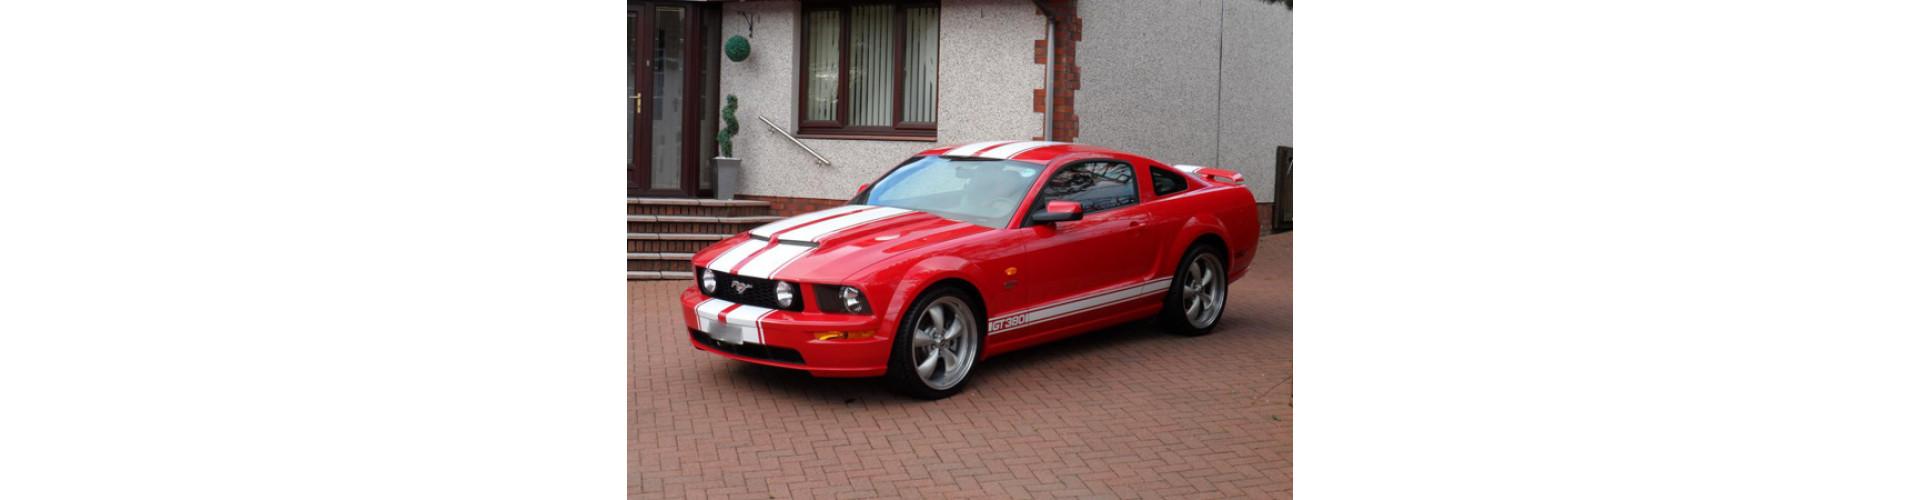 Бесконтактная мойка Ford Mustang 2005 года